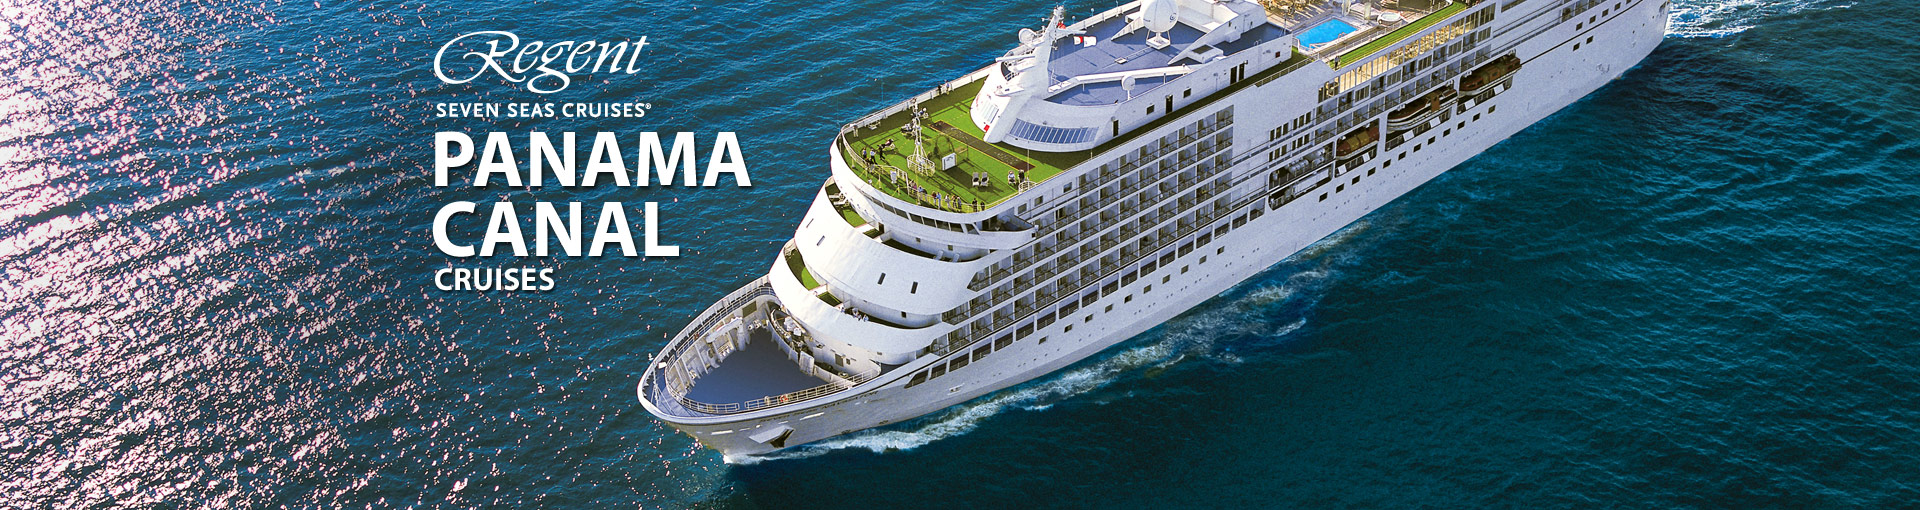 Regent Seven Seas Cruises Panama Canal Cruises